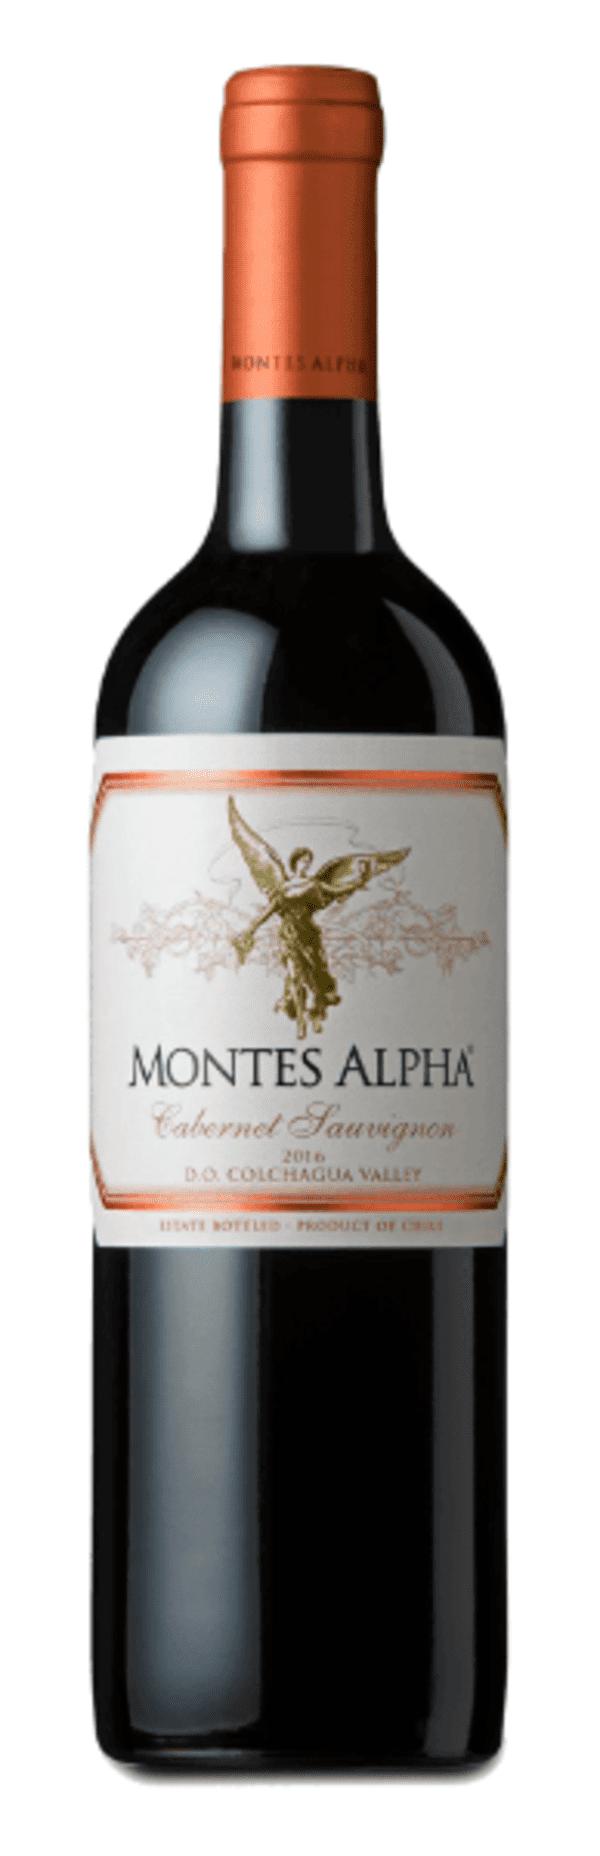 MONTES ALPHA CABERNET SAUVIGNON 2016 (TTO) (VINA MONTES)